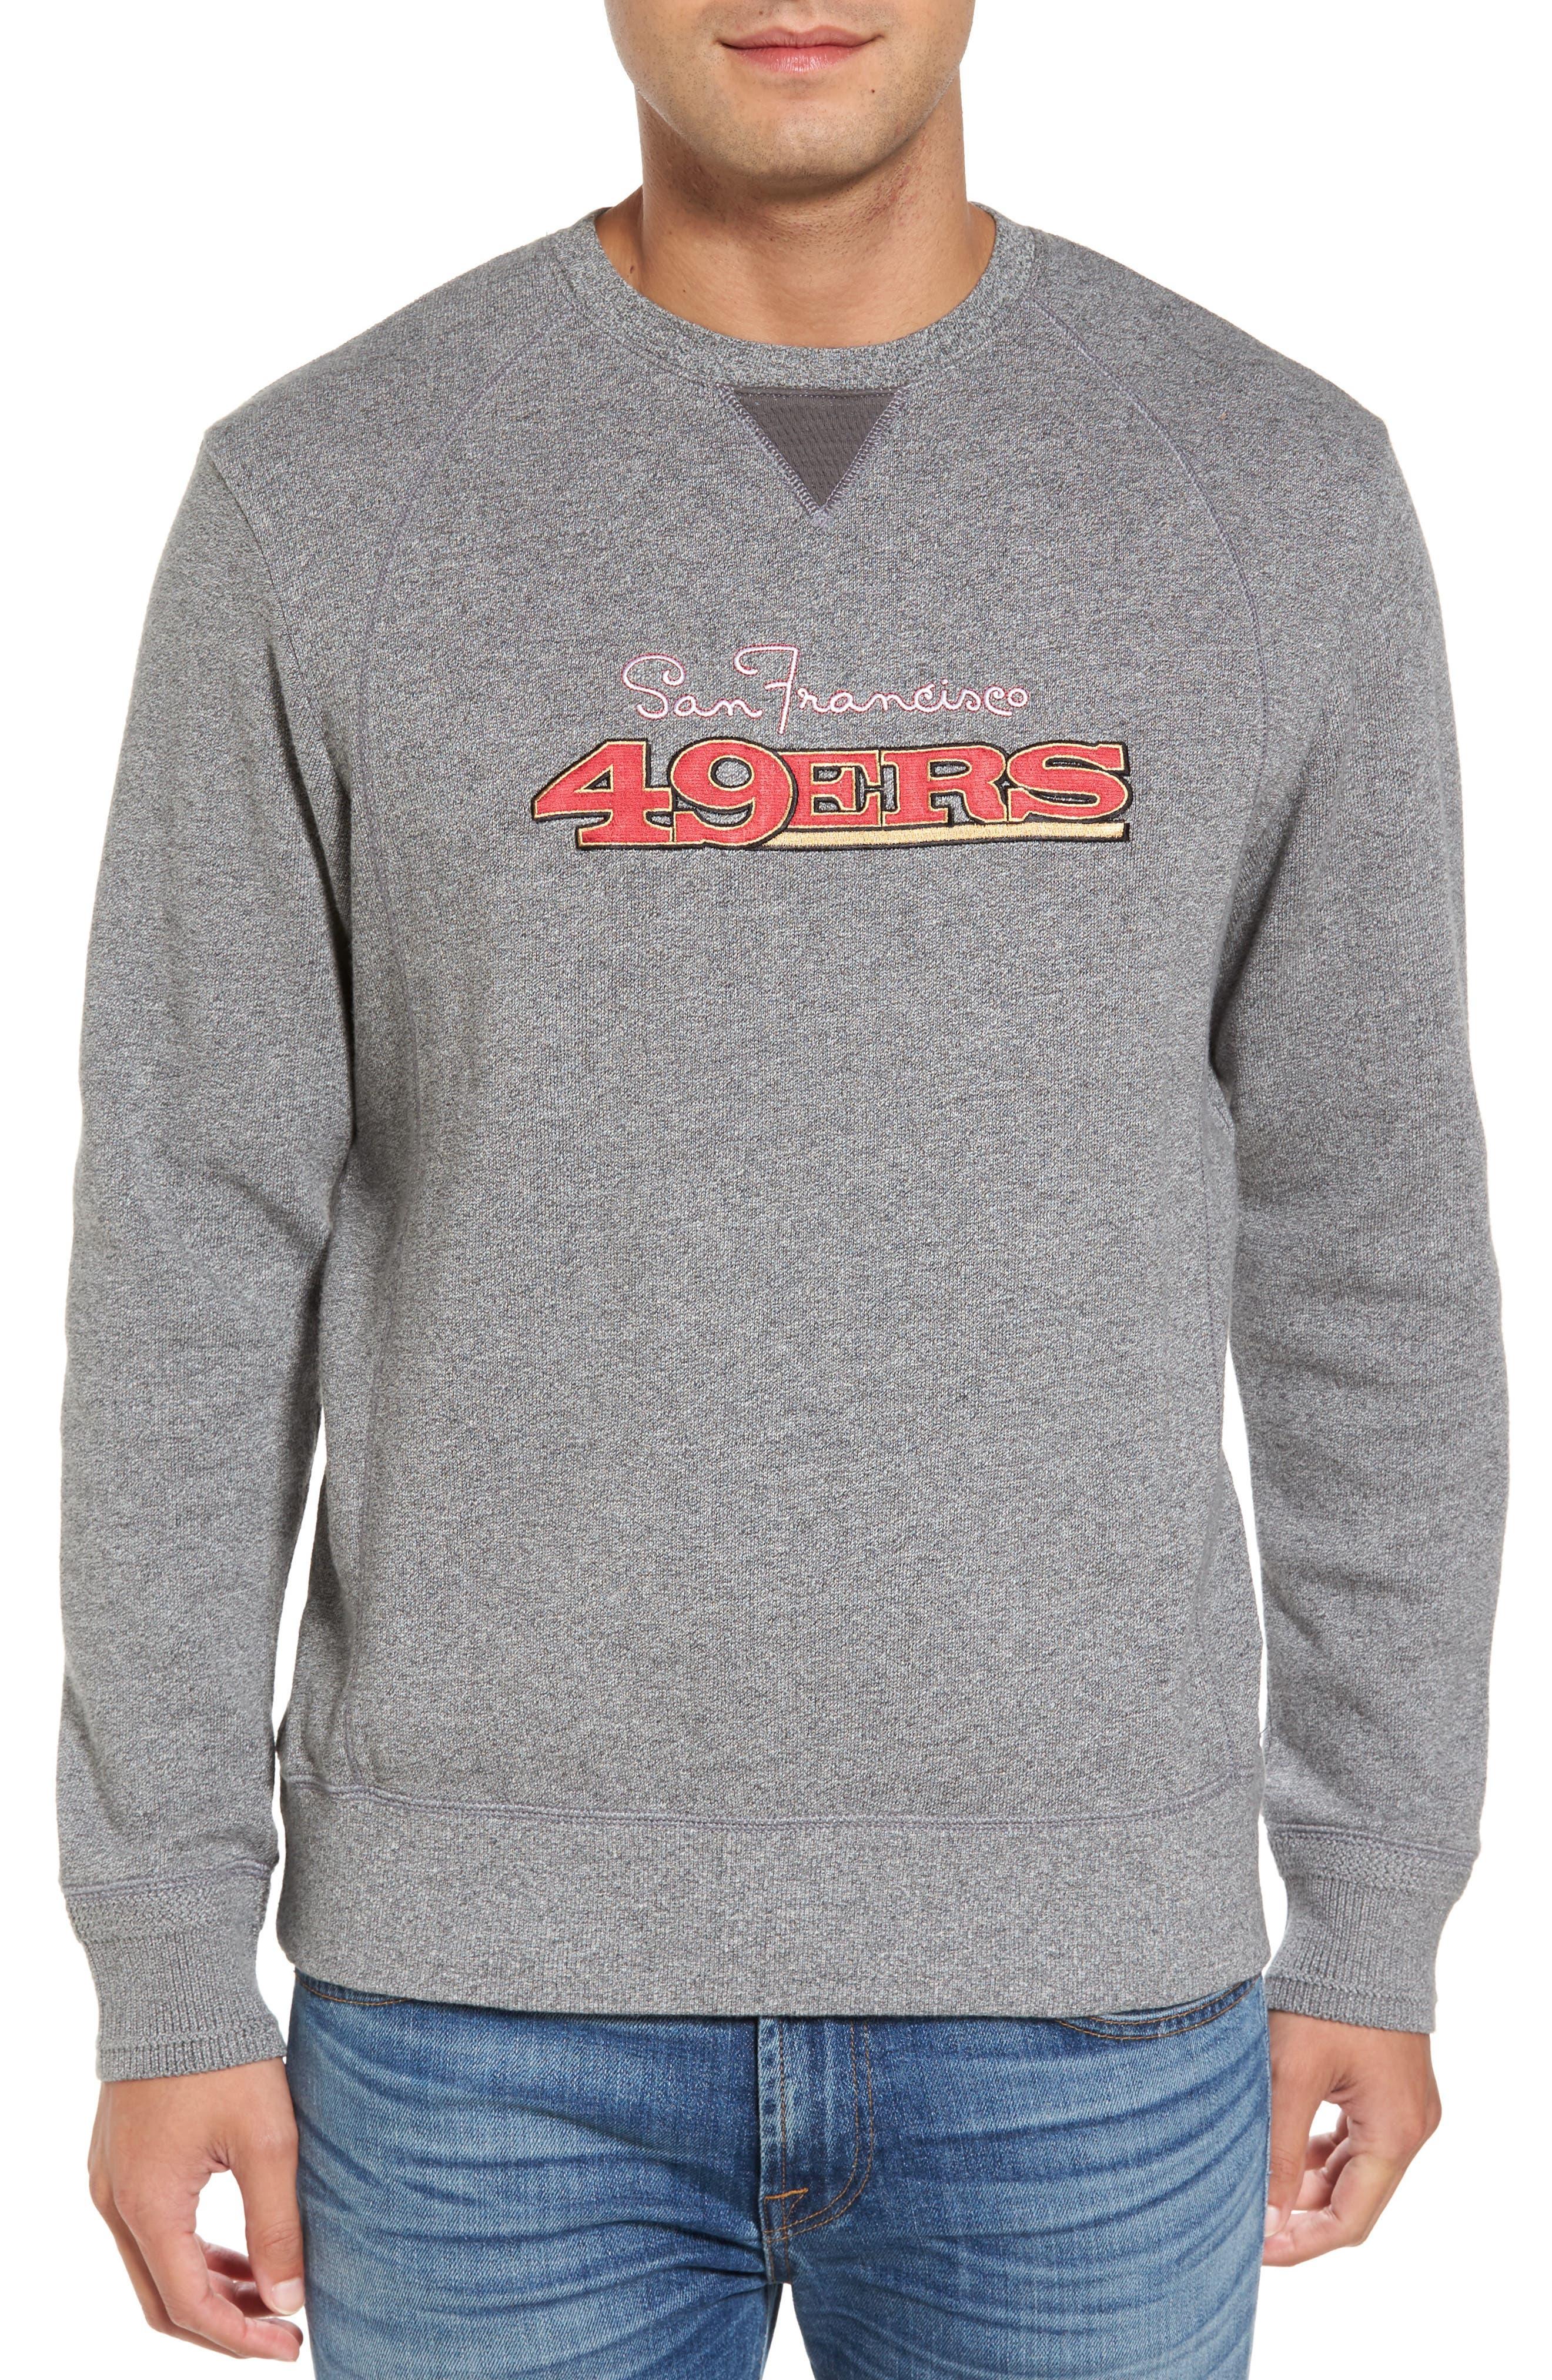 Tommy Bahama NFL Stitch of Liberty Embroidered Crewneck Sweatshirt